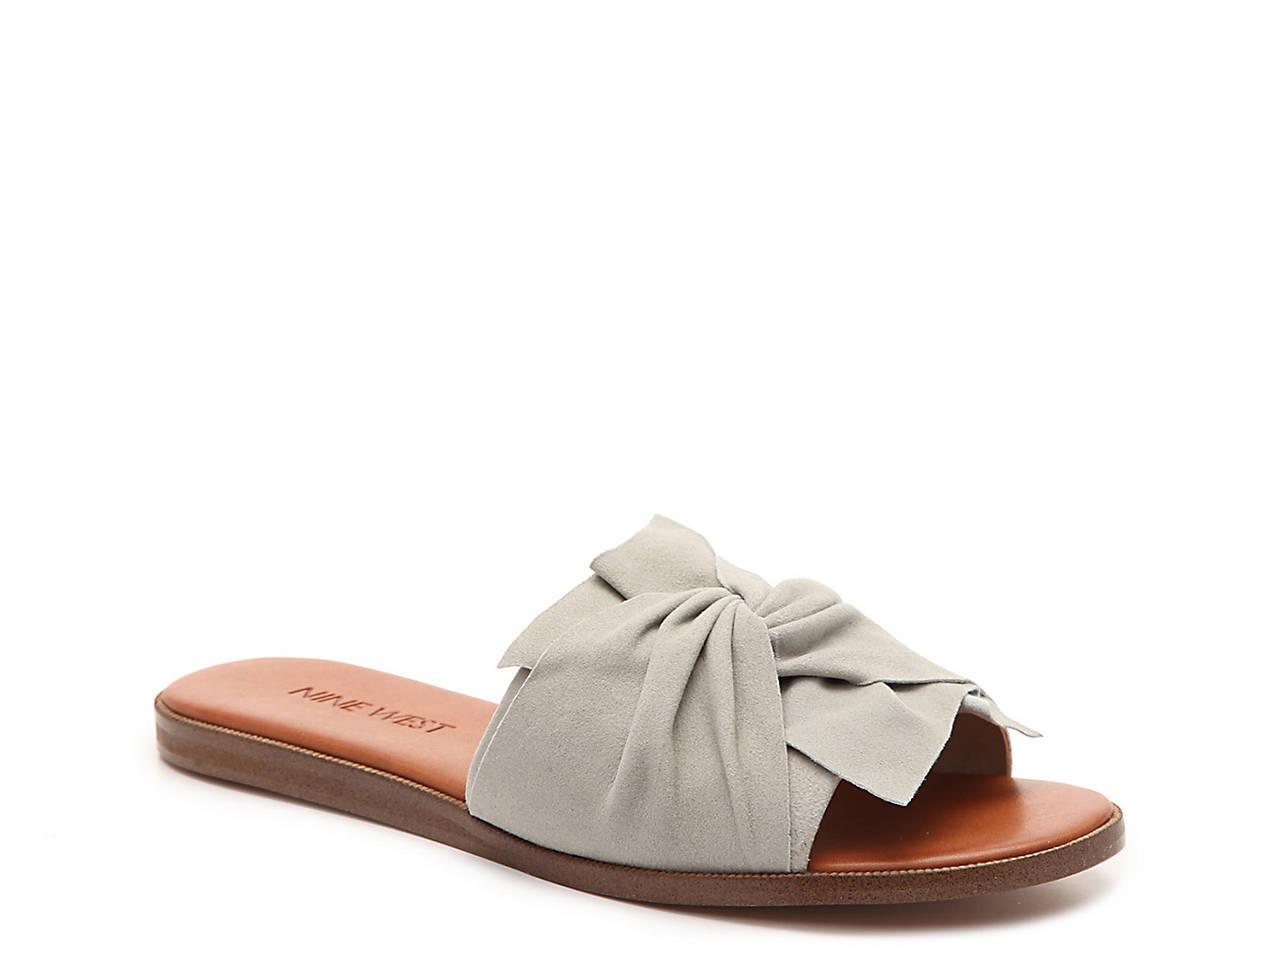 Nine West Melenda Flat Sandal Women s Shoes   DSW b8094bf661